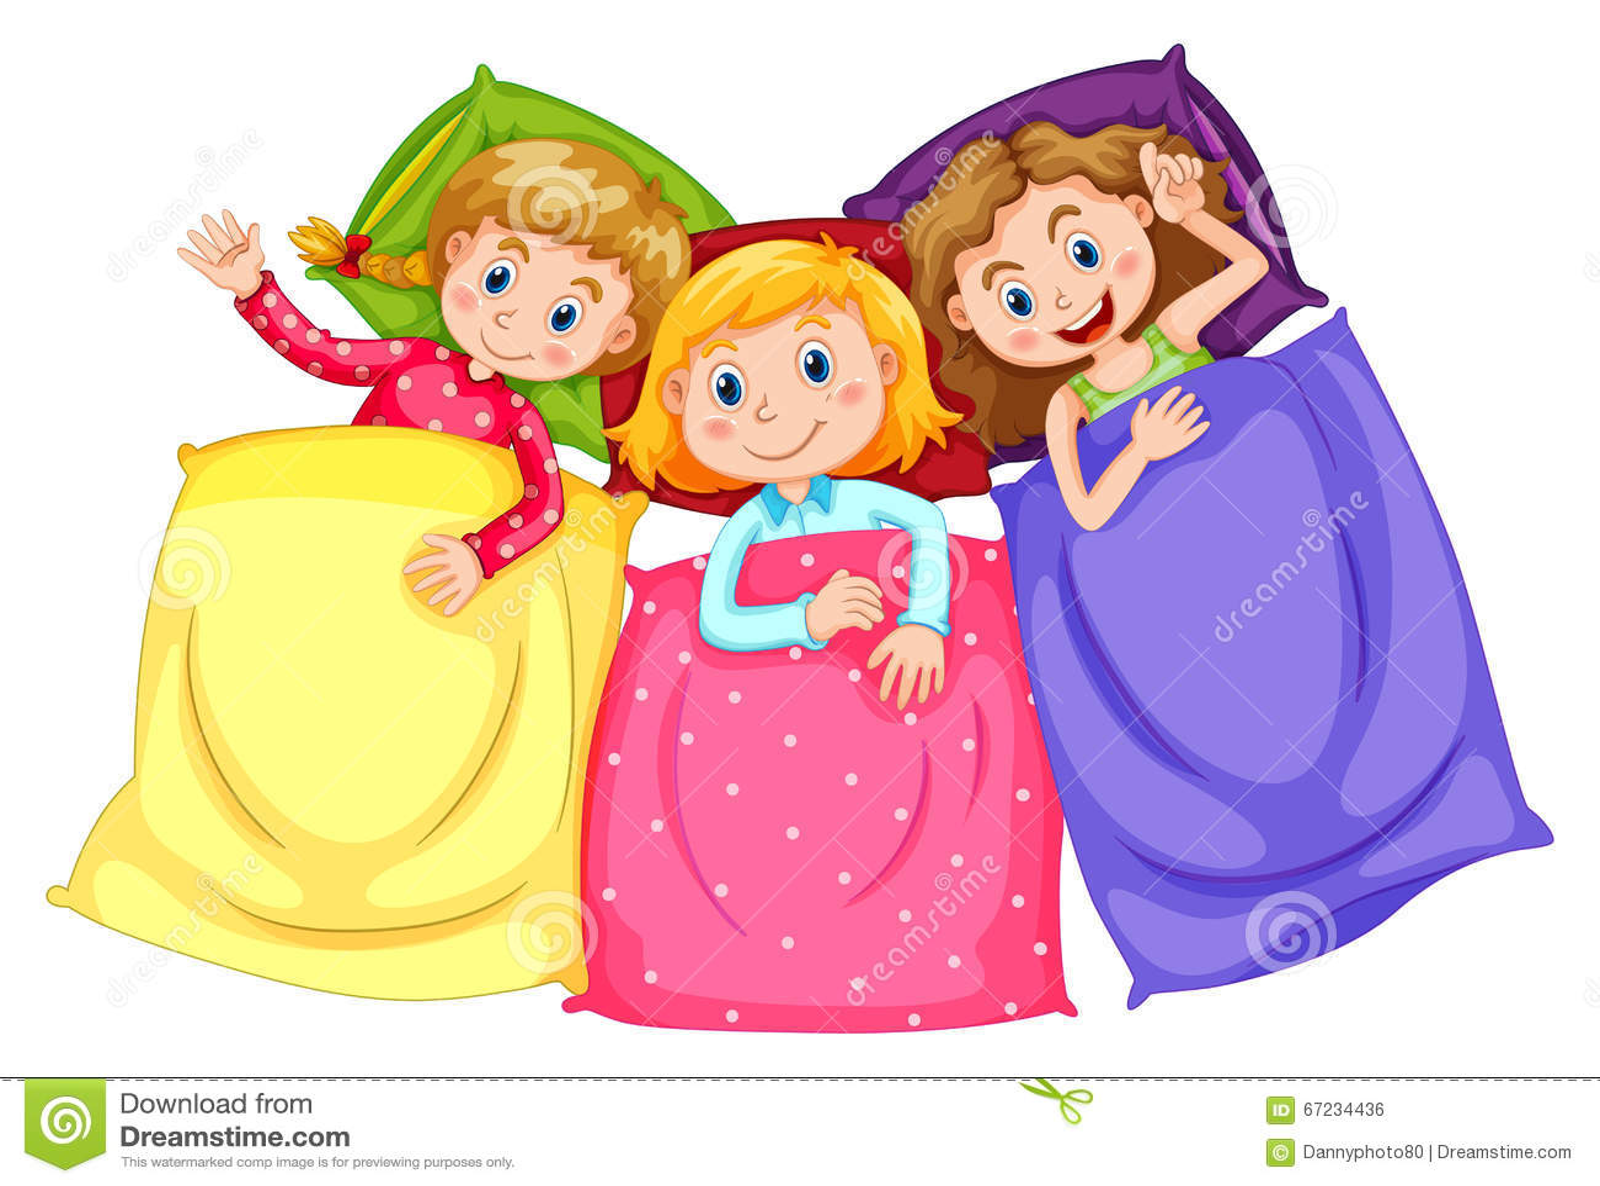 filles dans des pyjamas  u00e0 la soir u00e9e pyjamas illustration blue sleeping bag clipart sleeping bag and pillow clipart